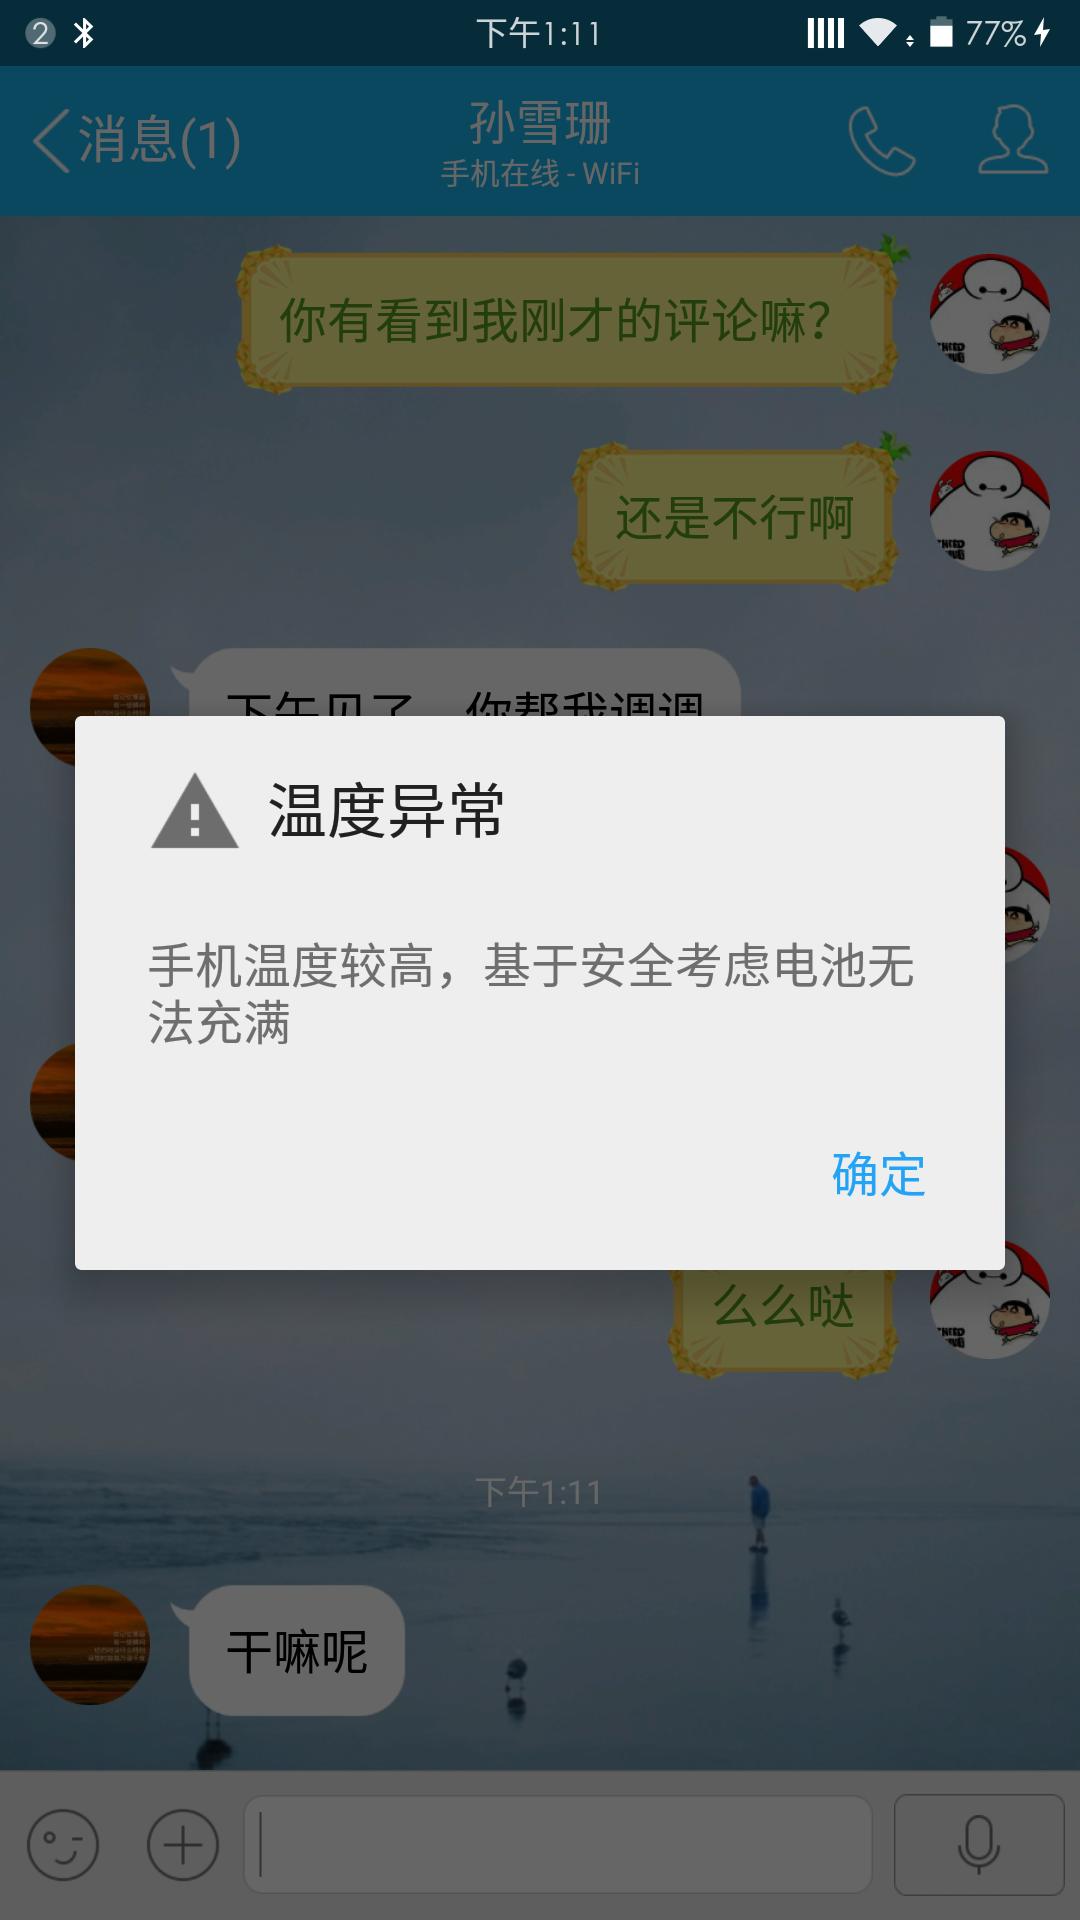 Screenshot_2015-08-02-13-11-50.png